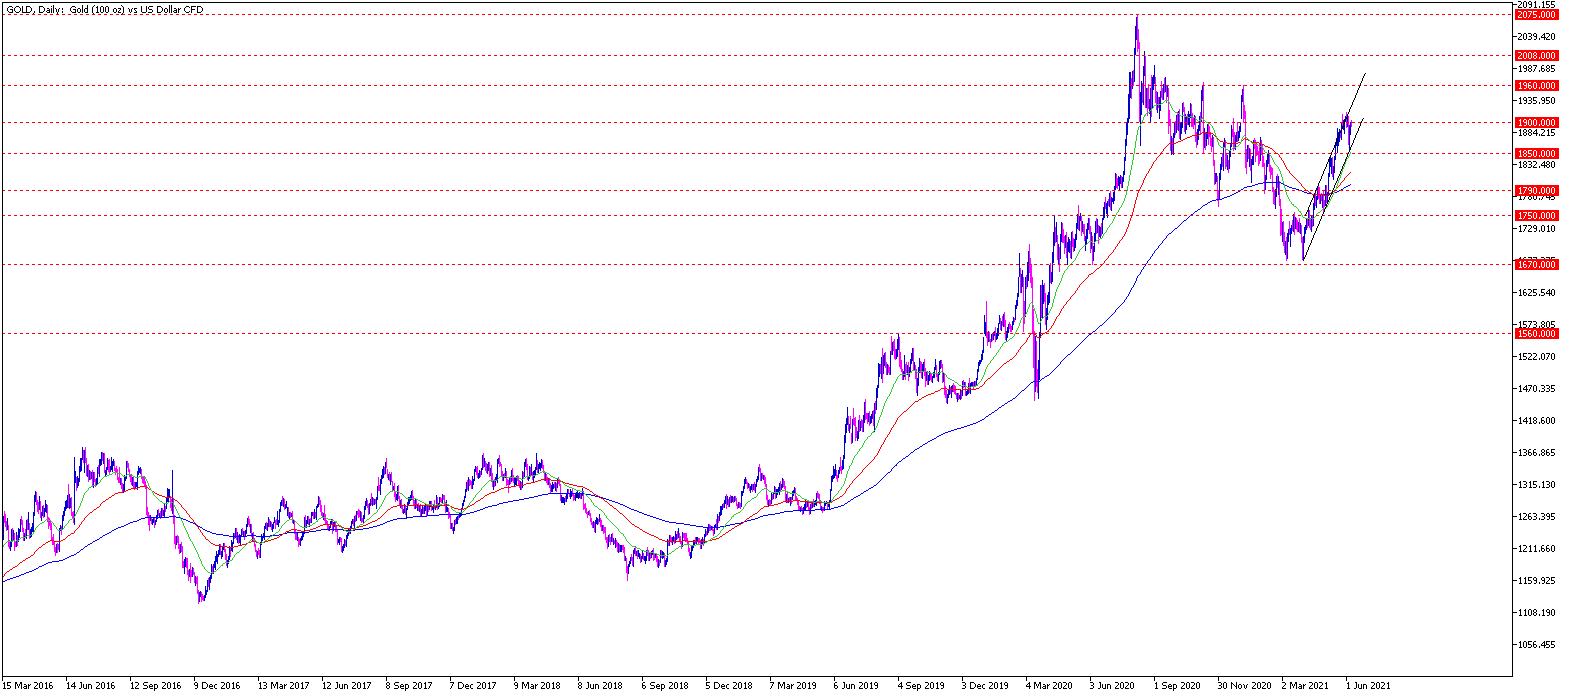 Gold Chartanalyse daily am 08.06.2021 - Gold Prognose